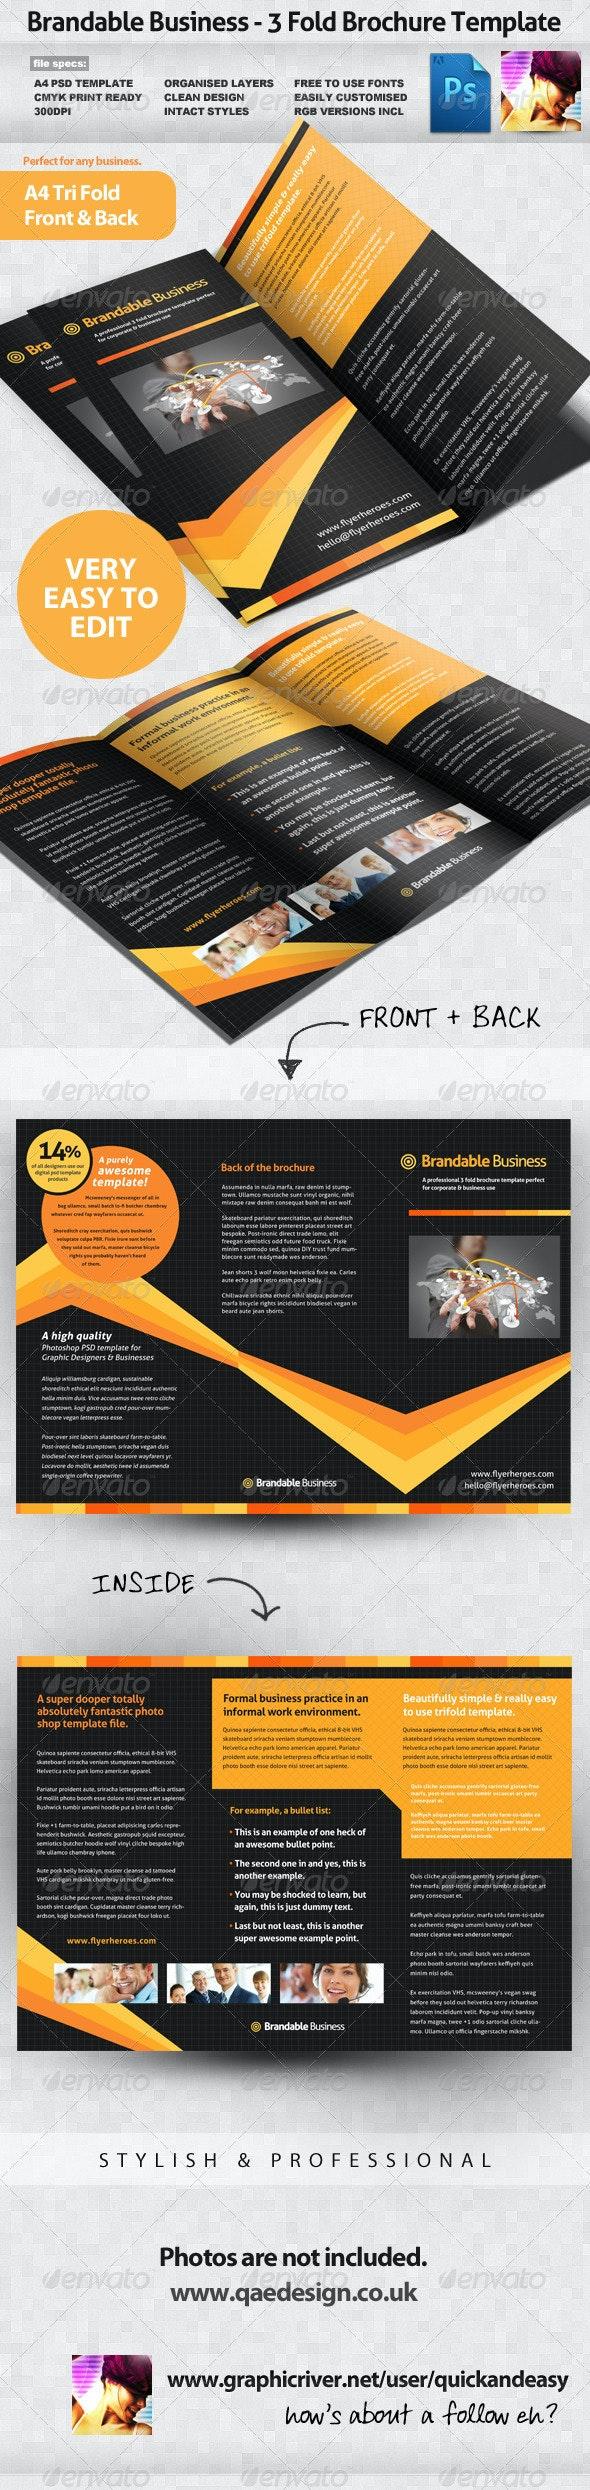 Brandable Business 3 Fold Brochure Template - Corporate Brochures